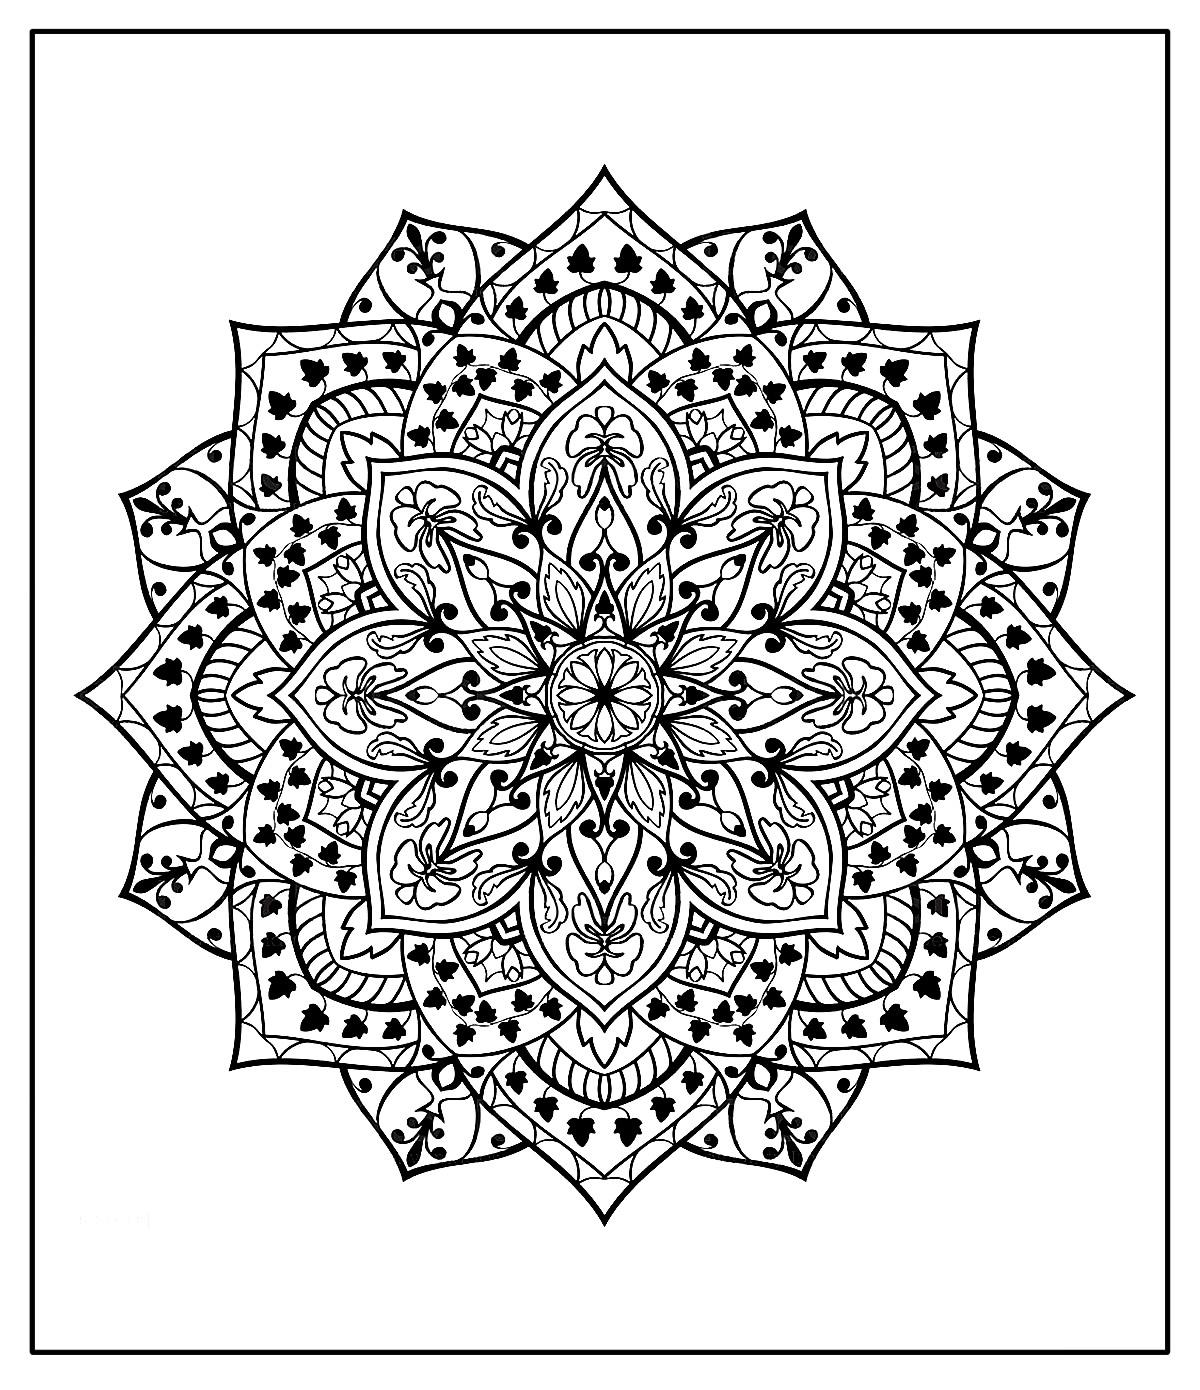 Página para colorir de Mandala